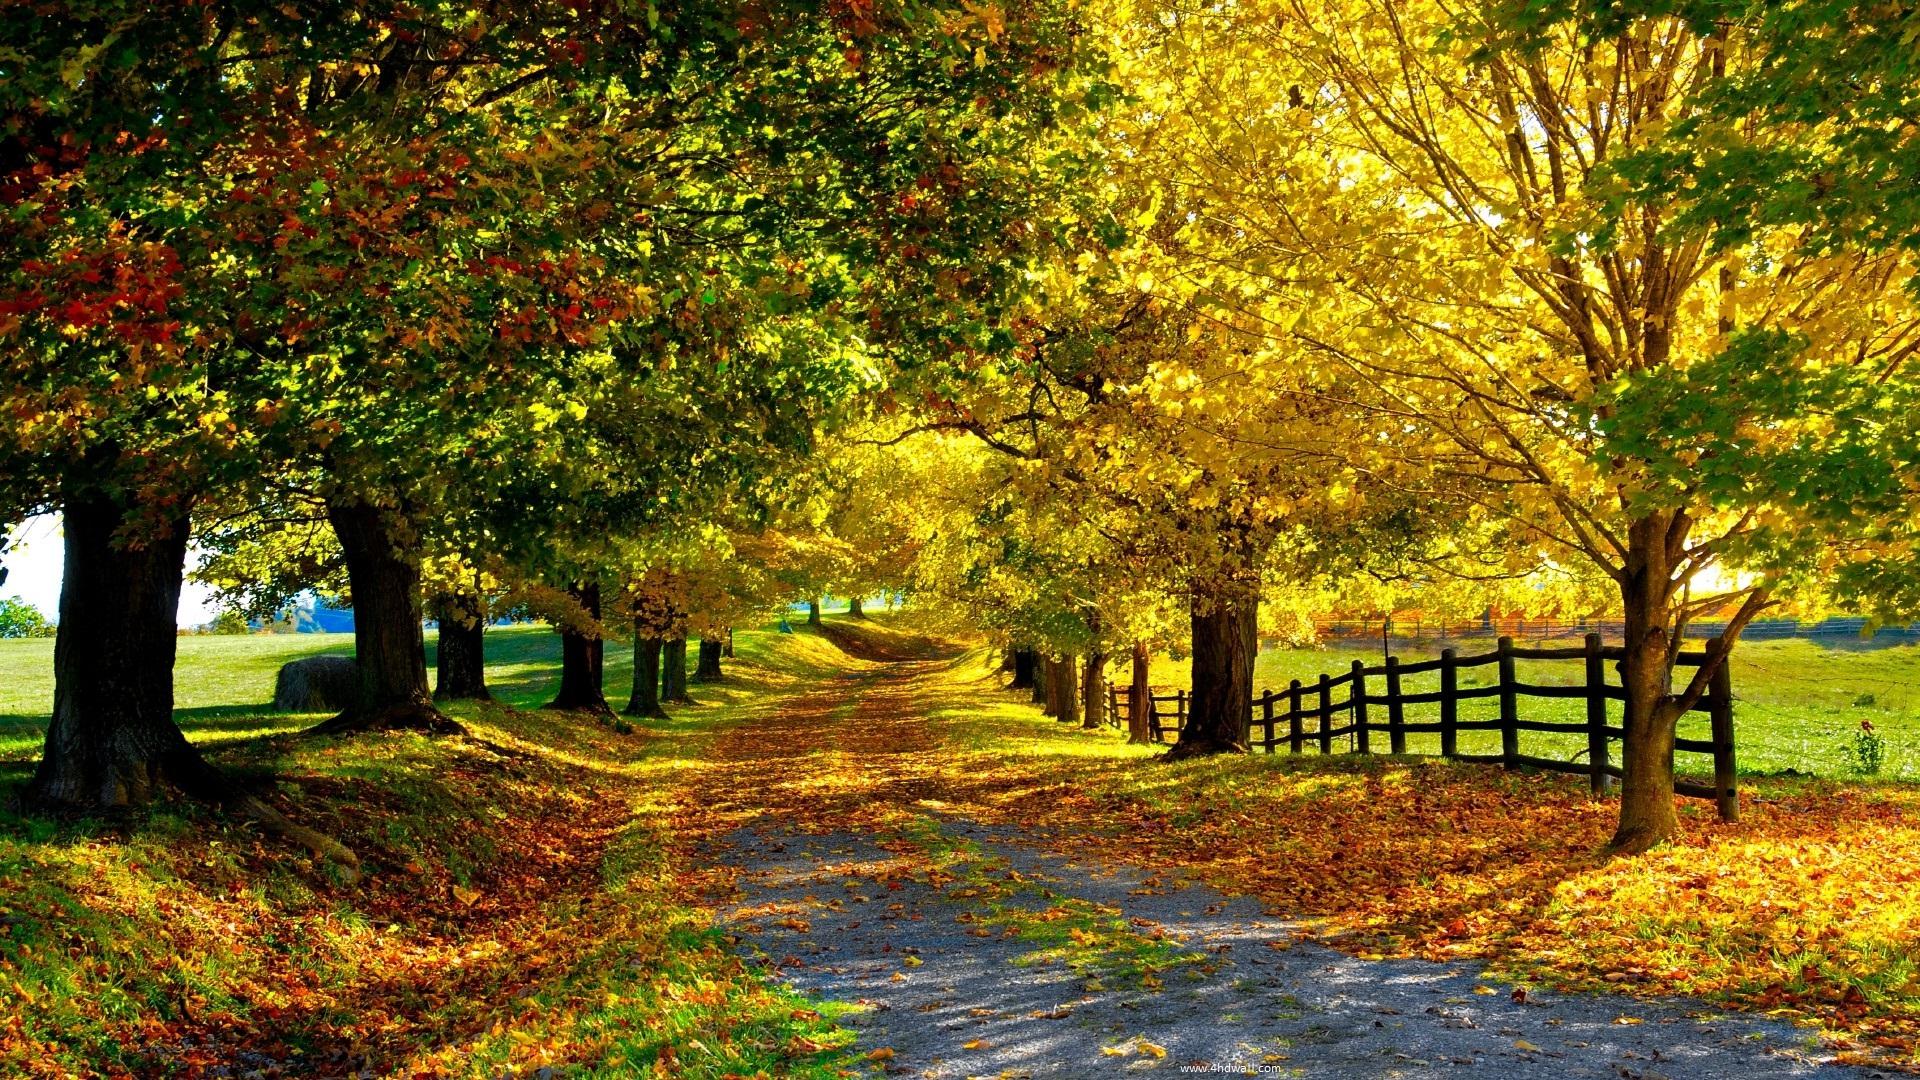 Fall Season Wallpaper Season Wallpaper Hd 478028 Hd